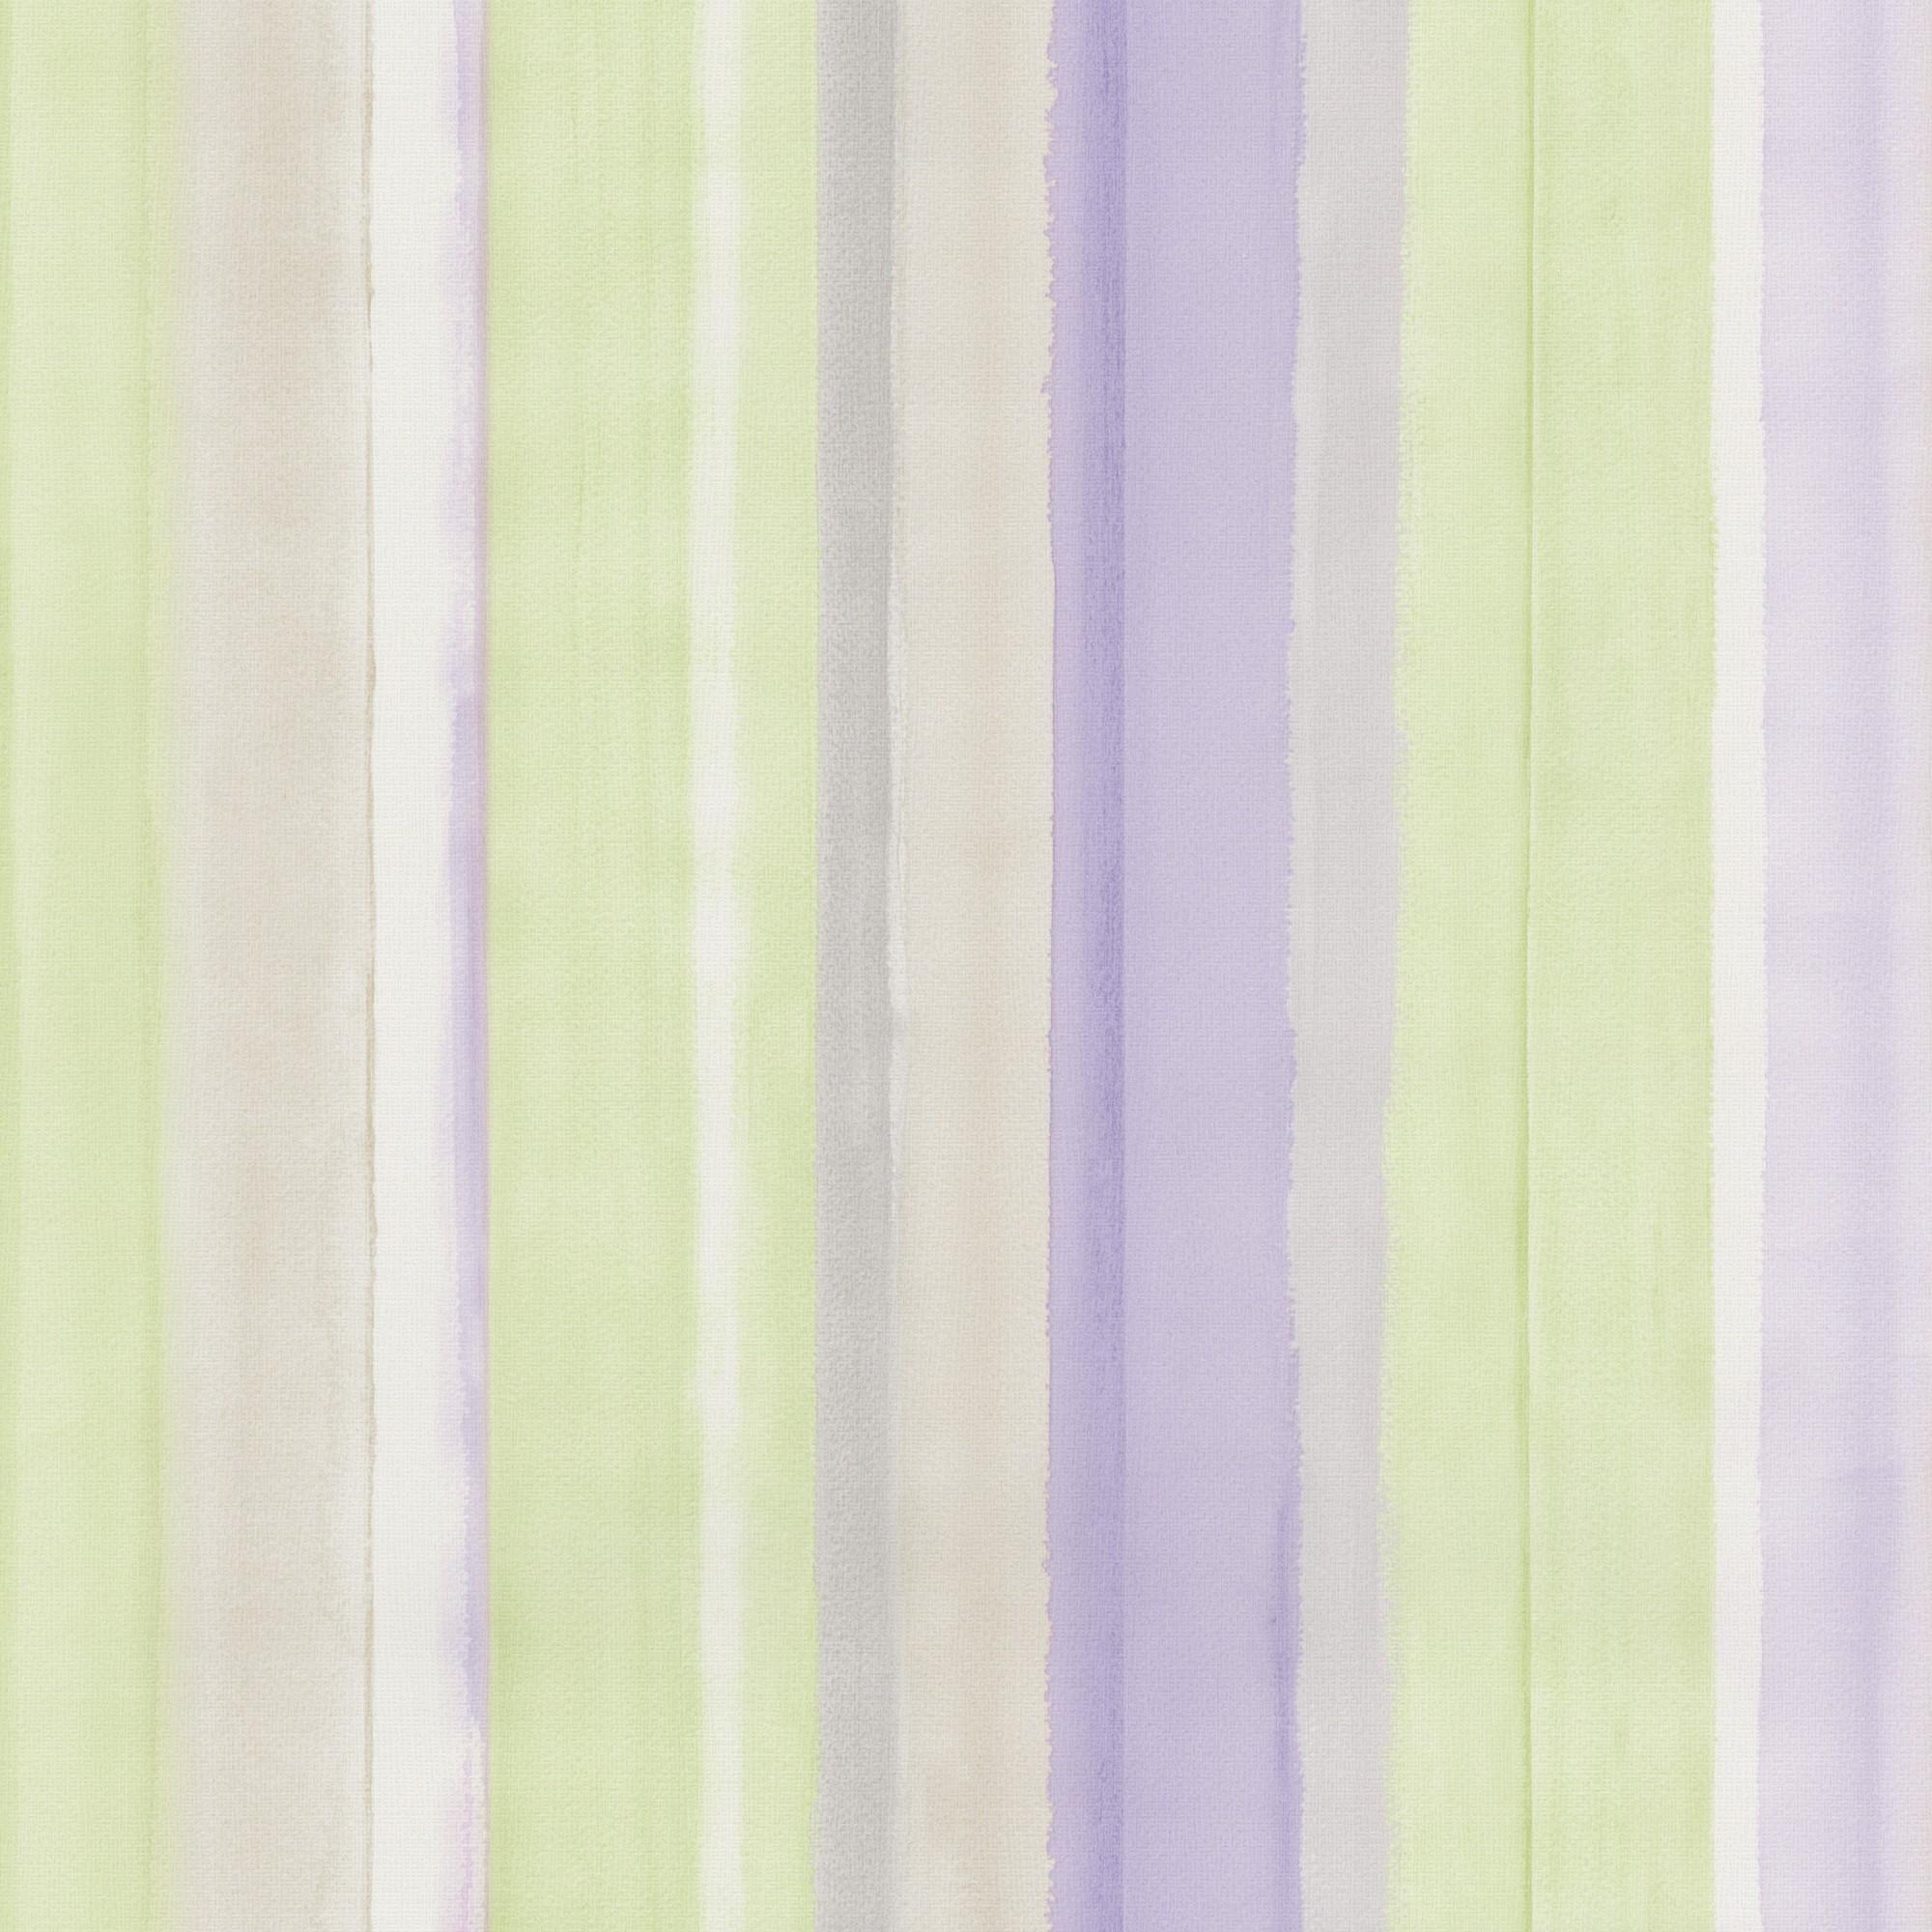 Tapeten Streifen Pastell : PS Tapete 4 ever 02330-60 0233060 Streifen pastell lila gr?n